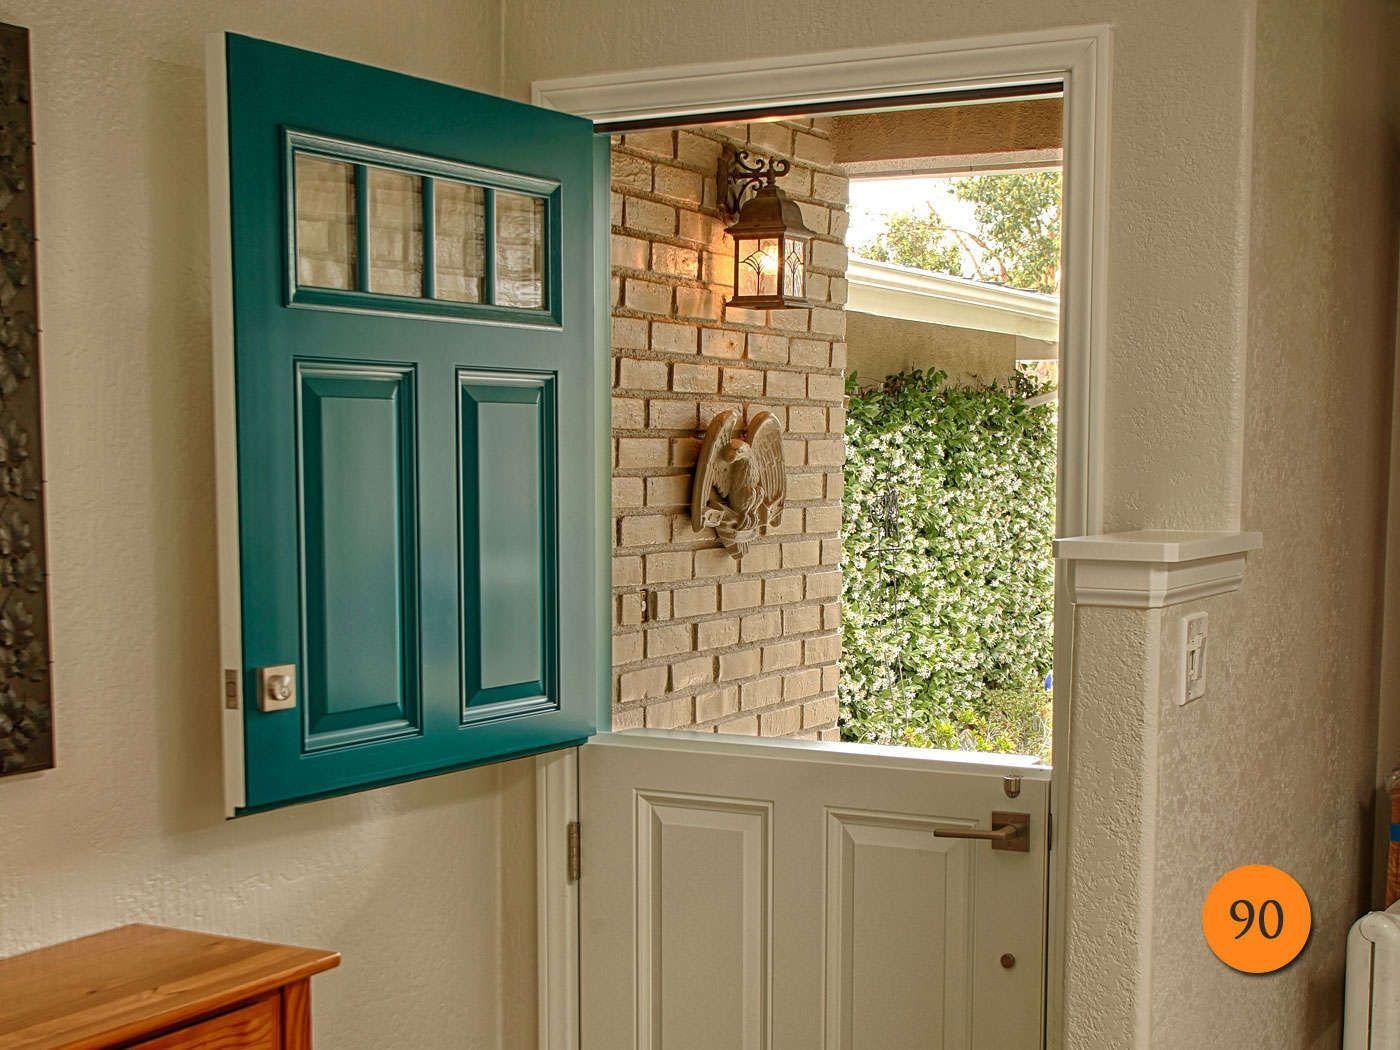 Exterior Dutch Door Hardware Fiberglass Doors Hold The Custom Abilities Of Decorative Metals Glass Spot Carvin